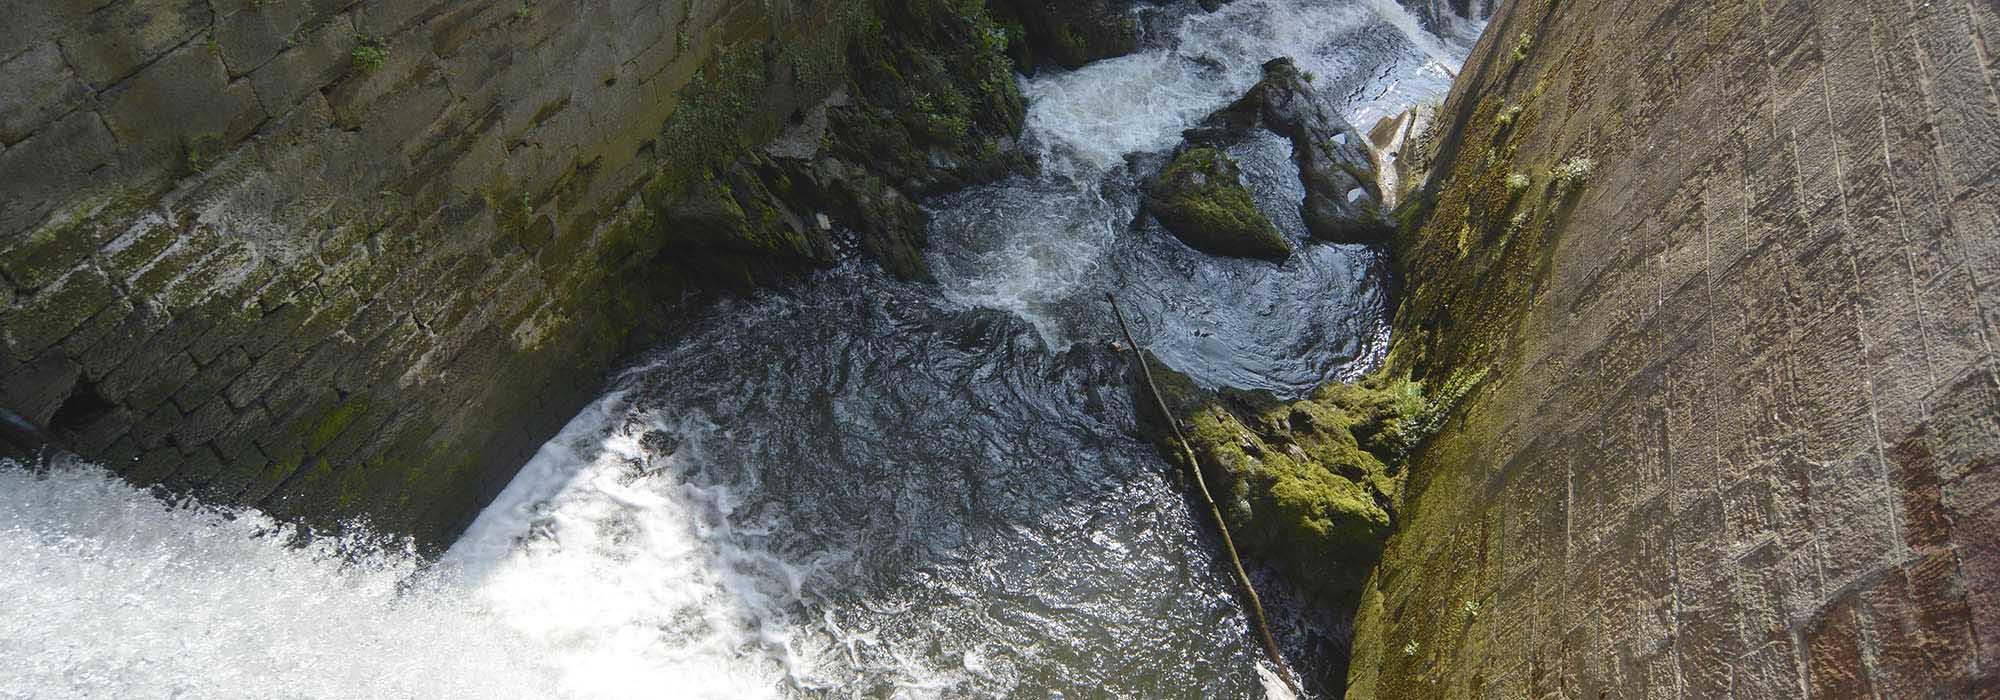 _ARN1236_Saarburg_Wasserfall